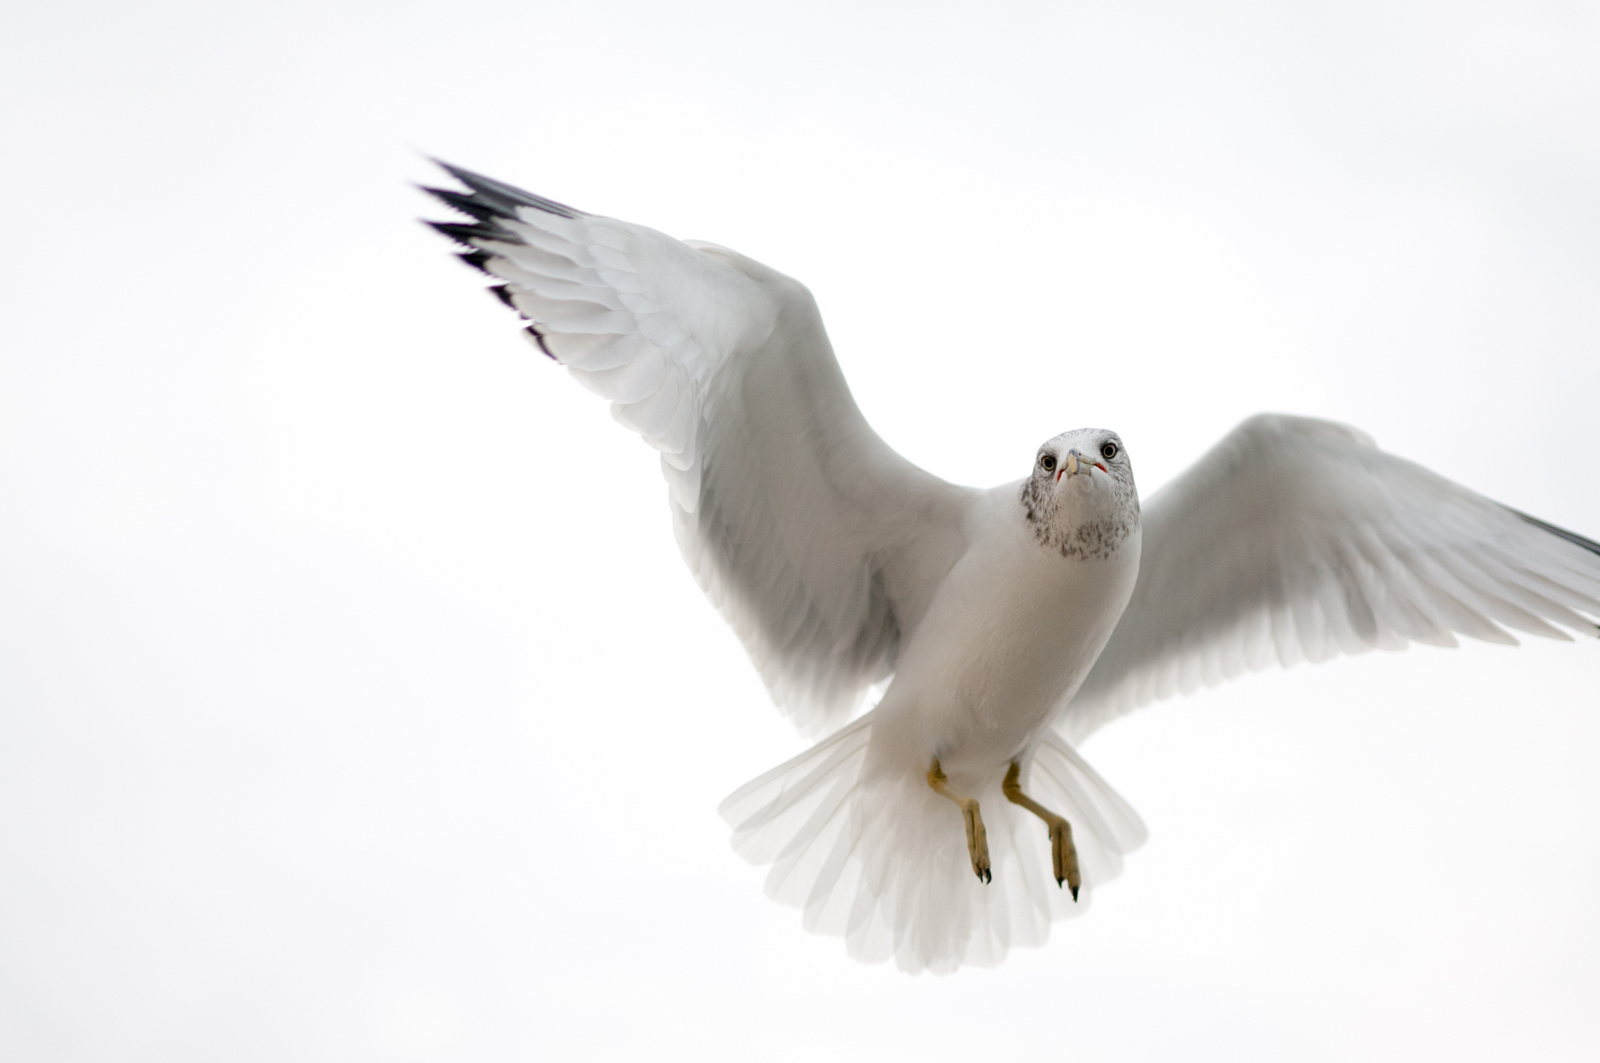 121916_Seagulls-44